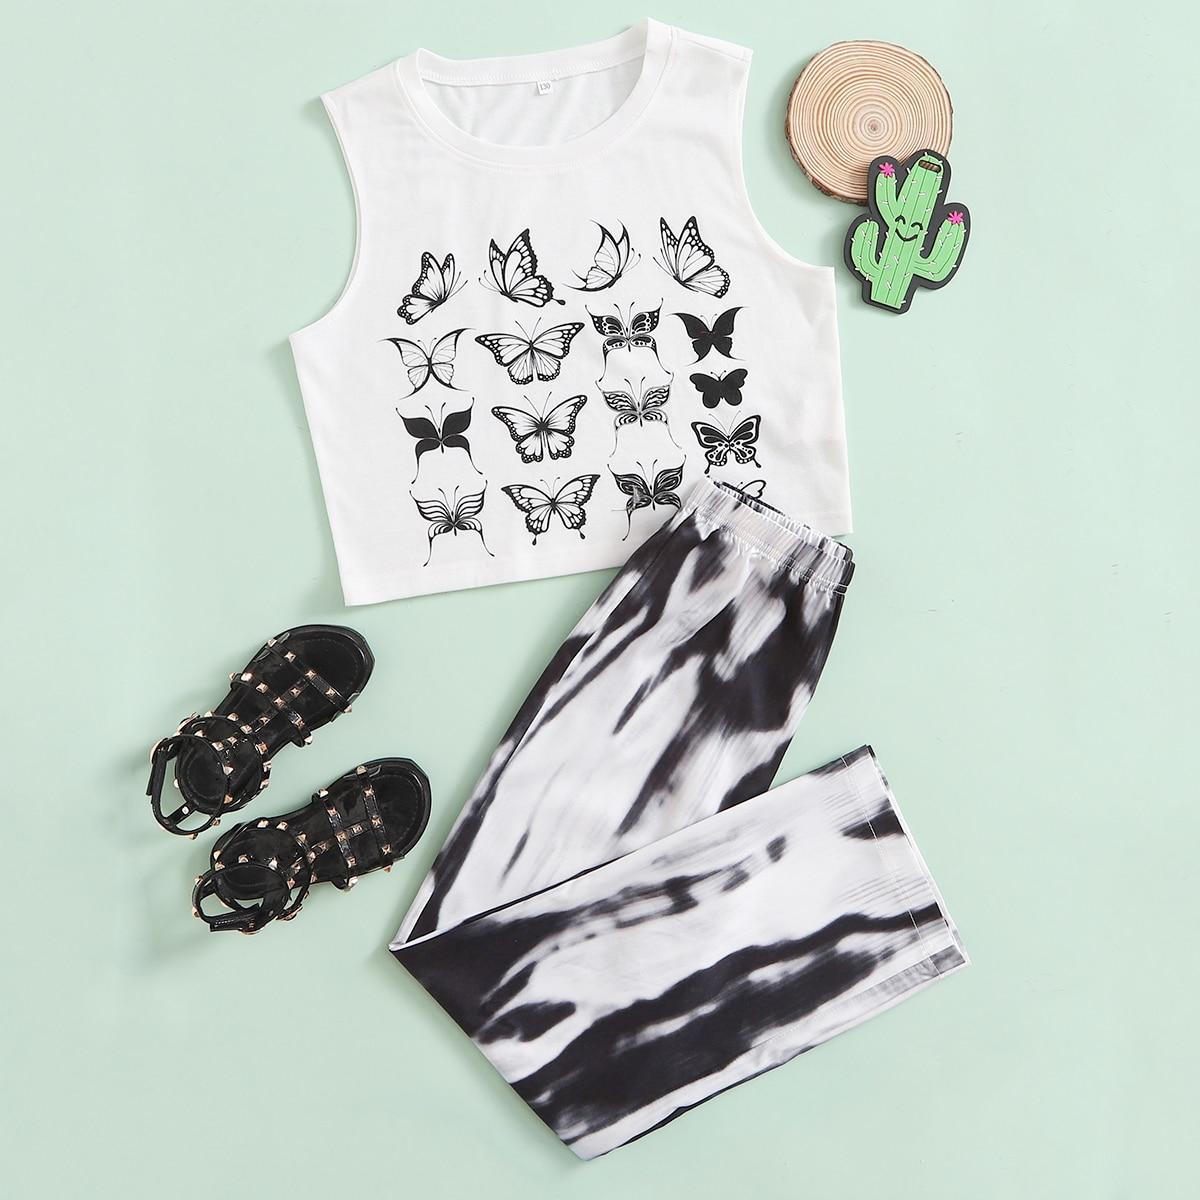 Girls Butterfly Print Tank Top & Pants